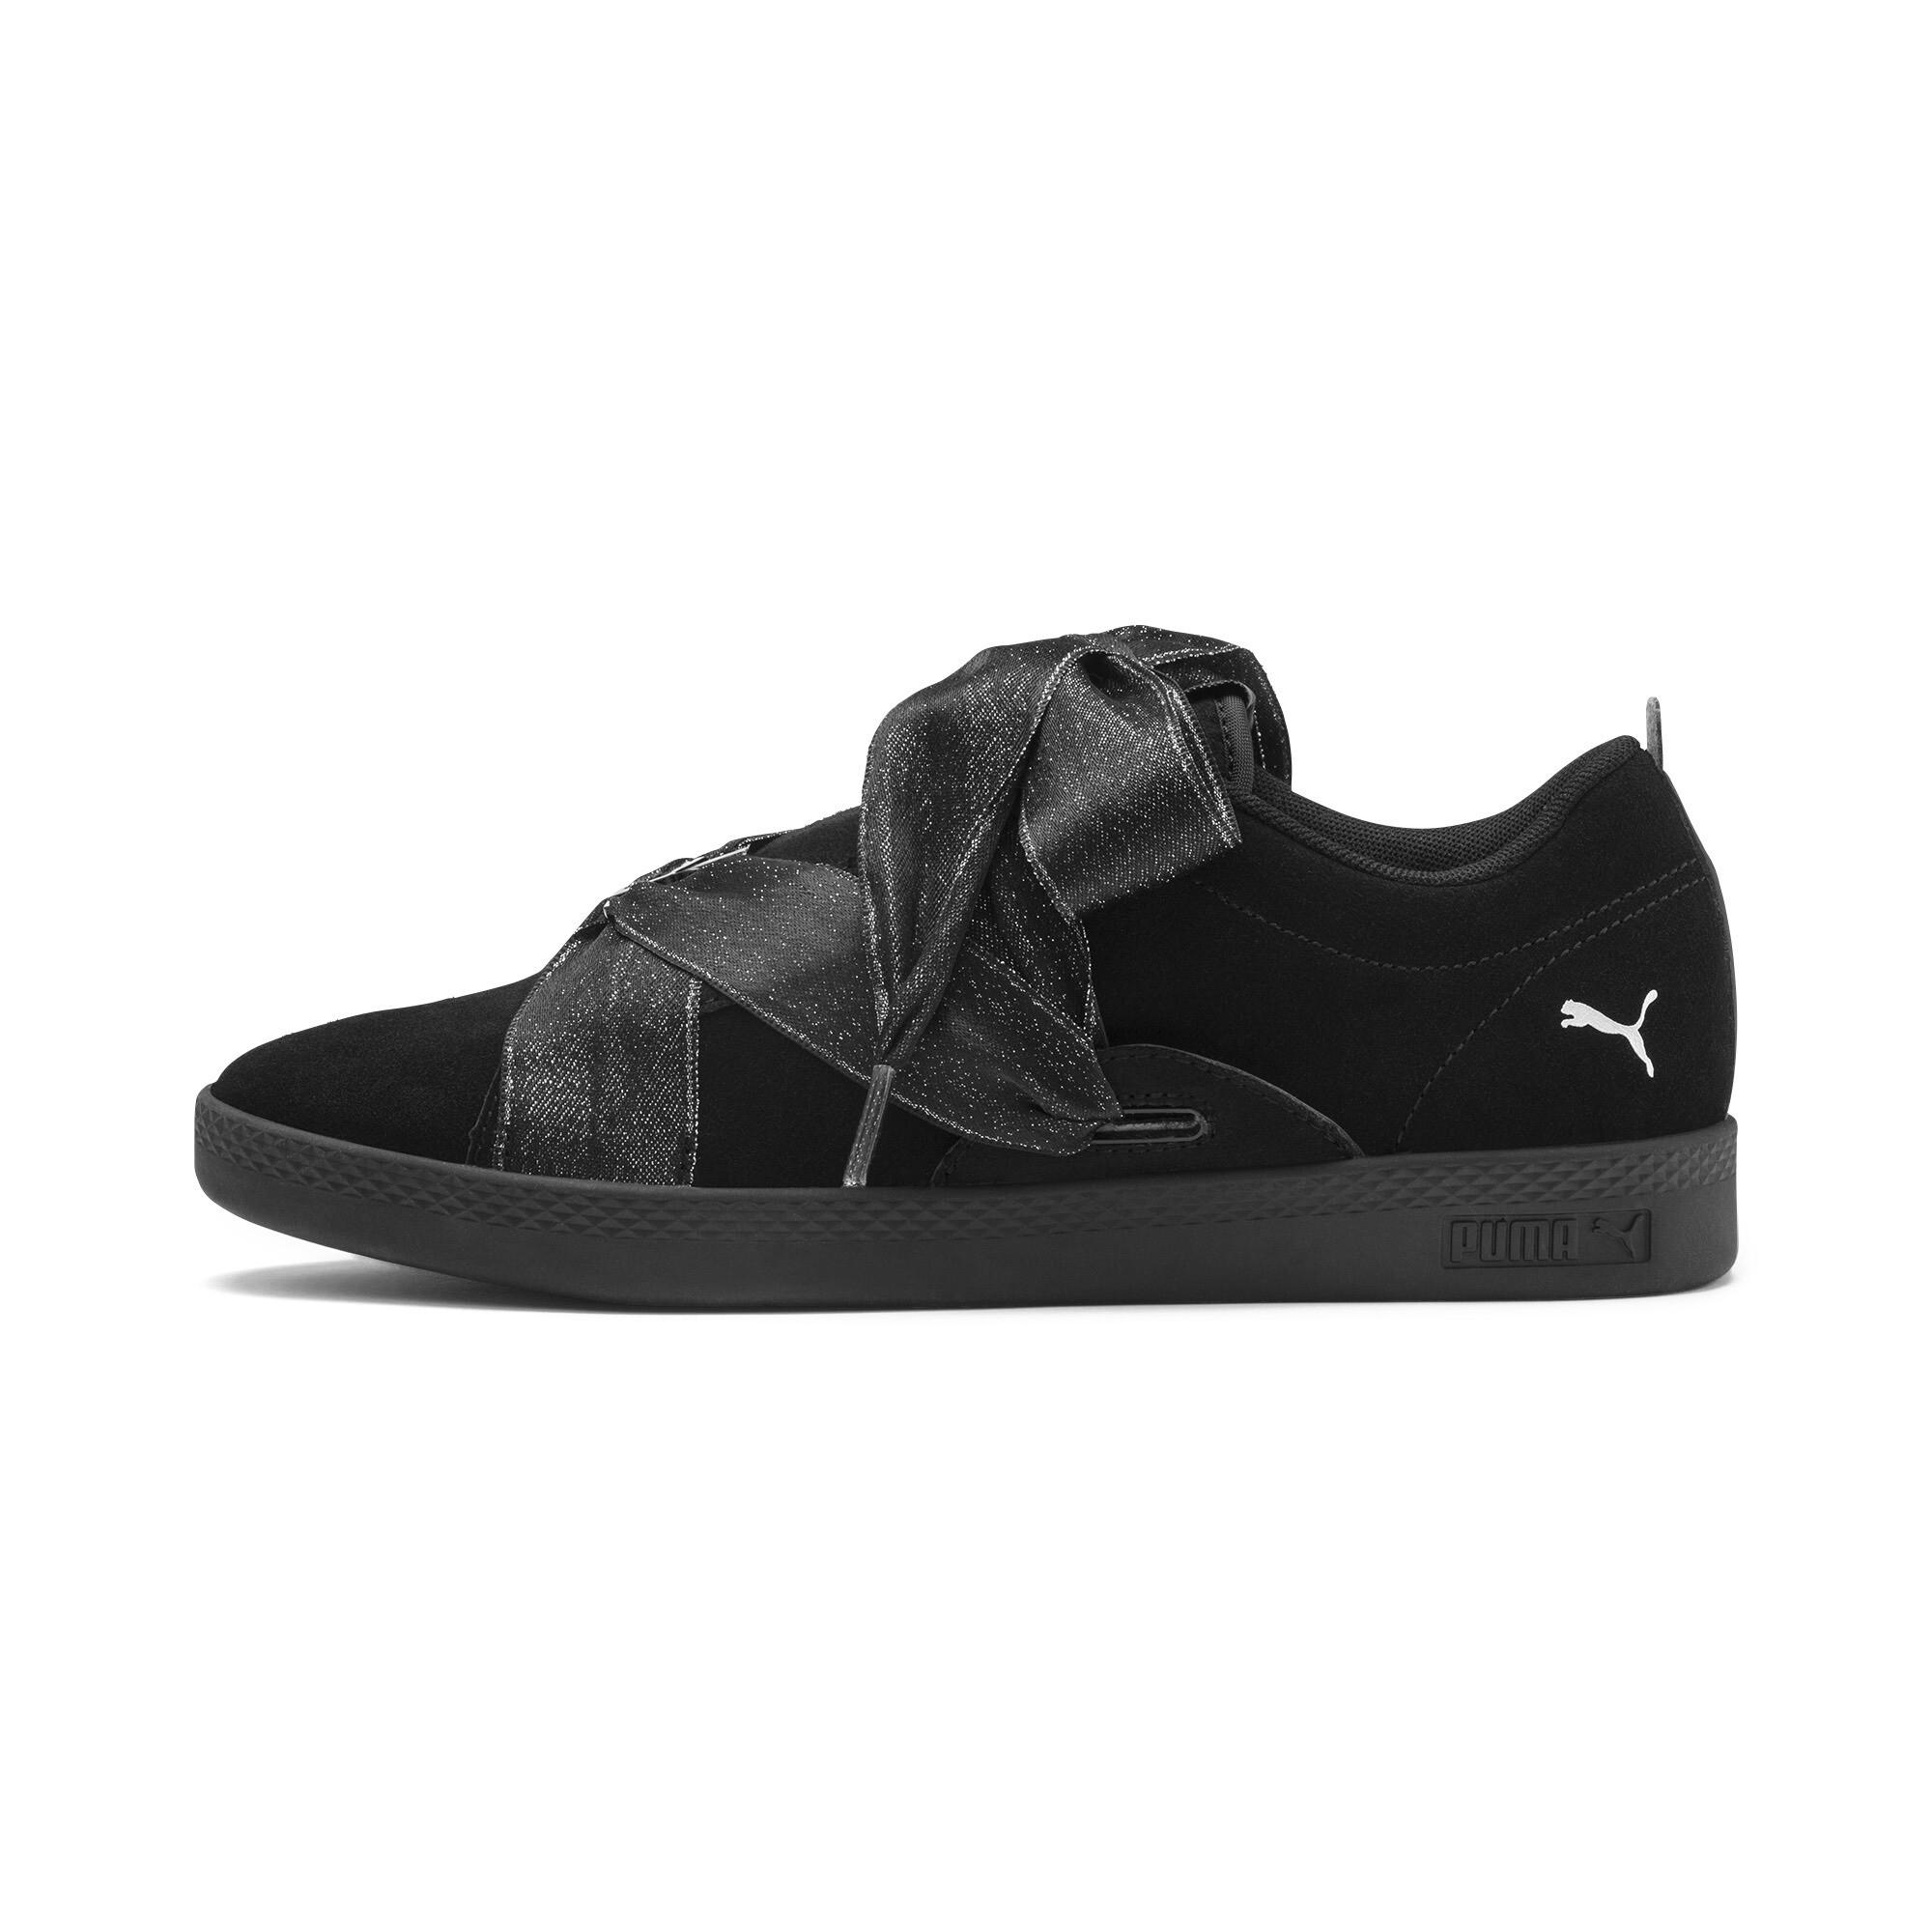 PUMA-PUMA-Smash-Astral-Buckle-Women-s-Sneakers-Women-Shoe-Basics thumbnail 11